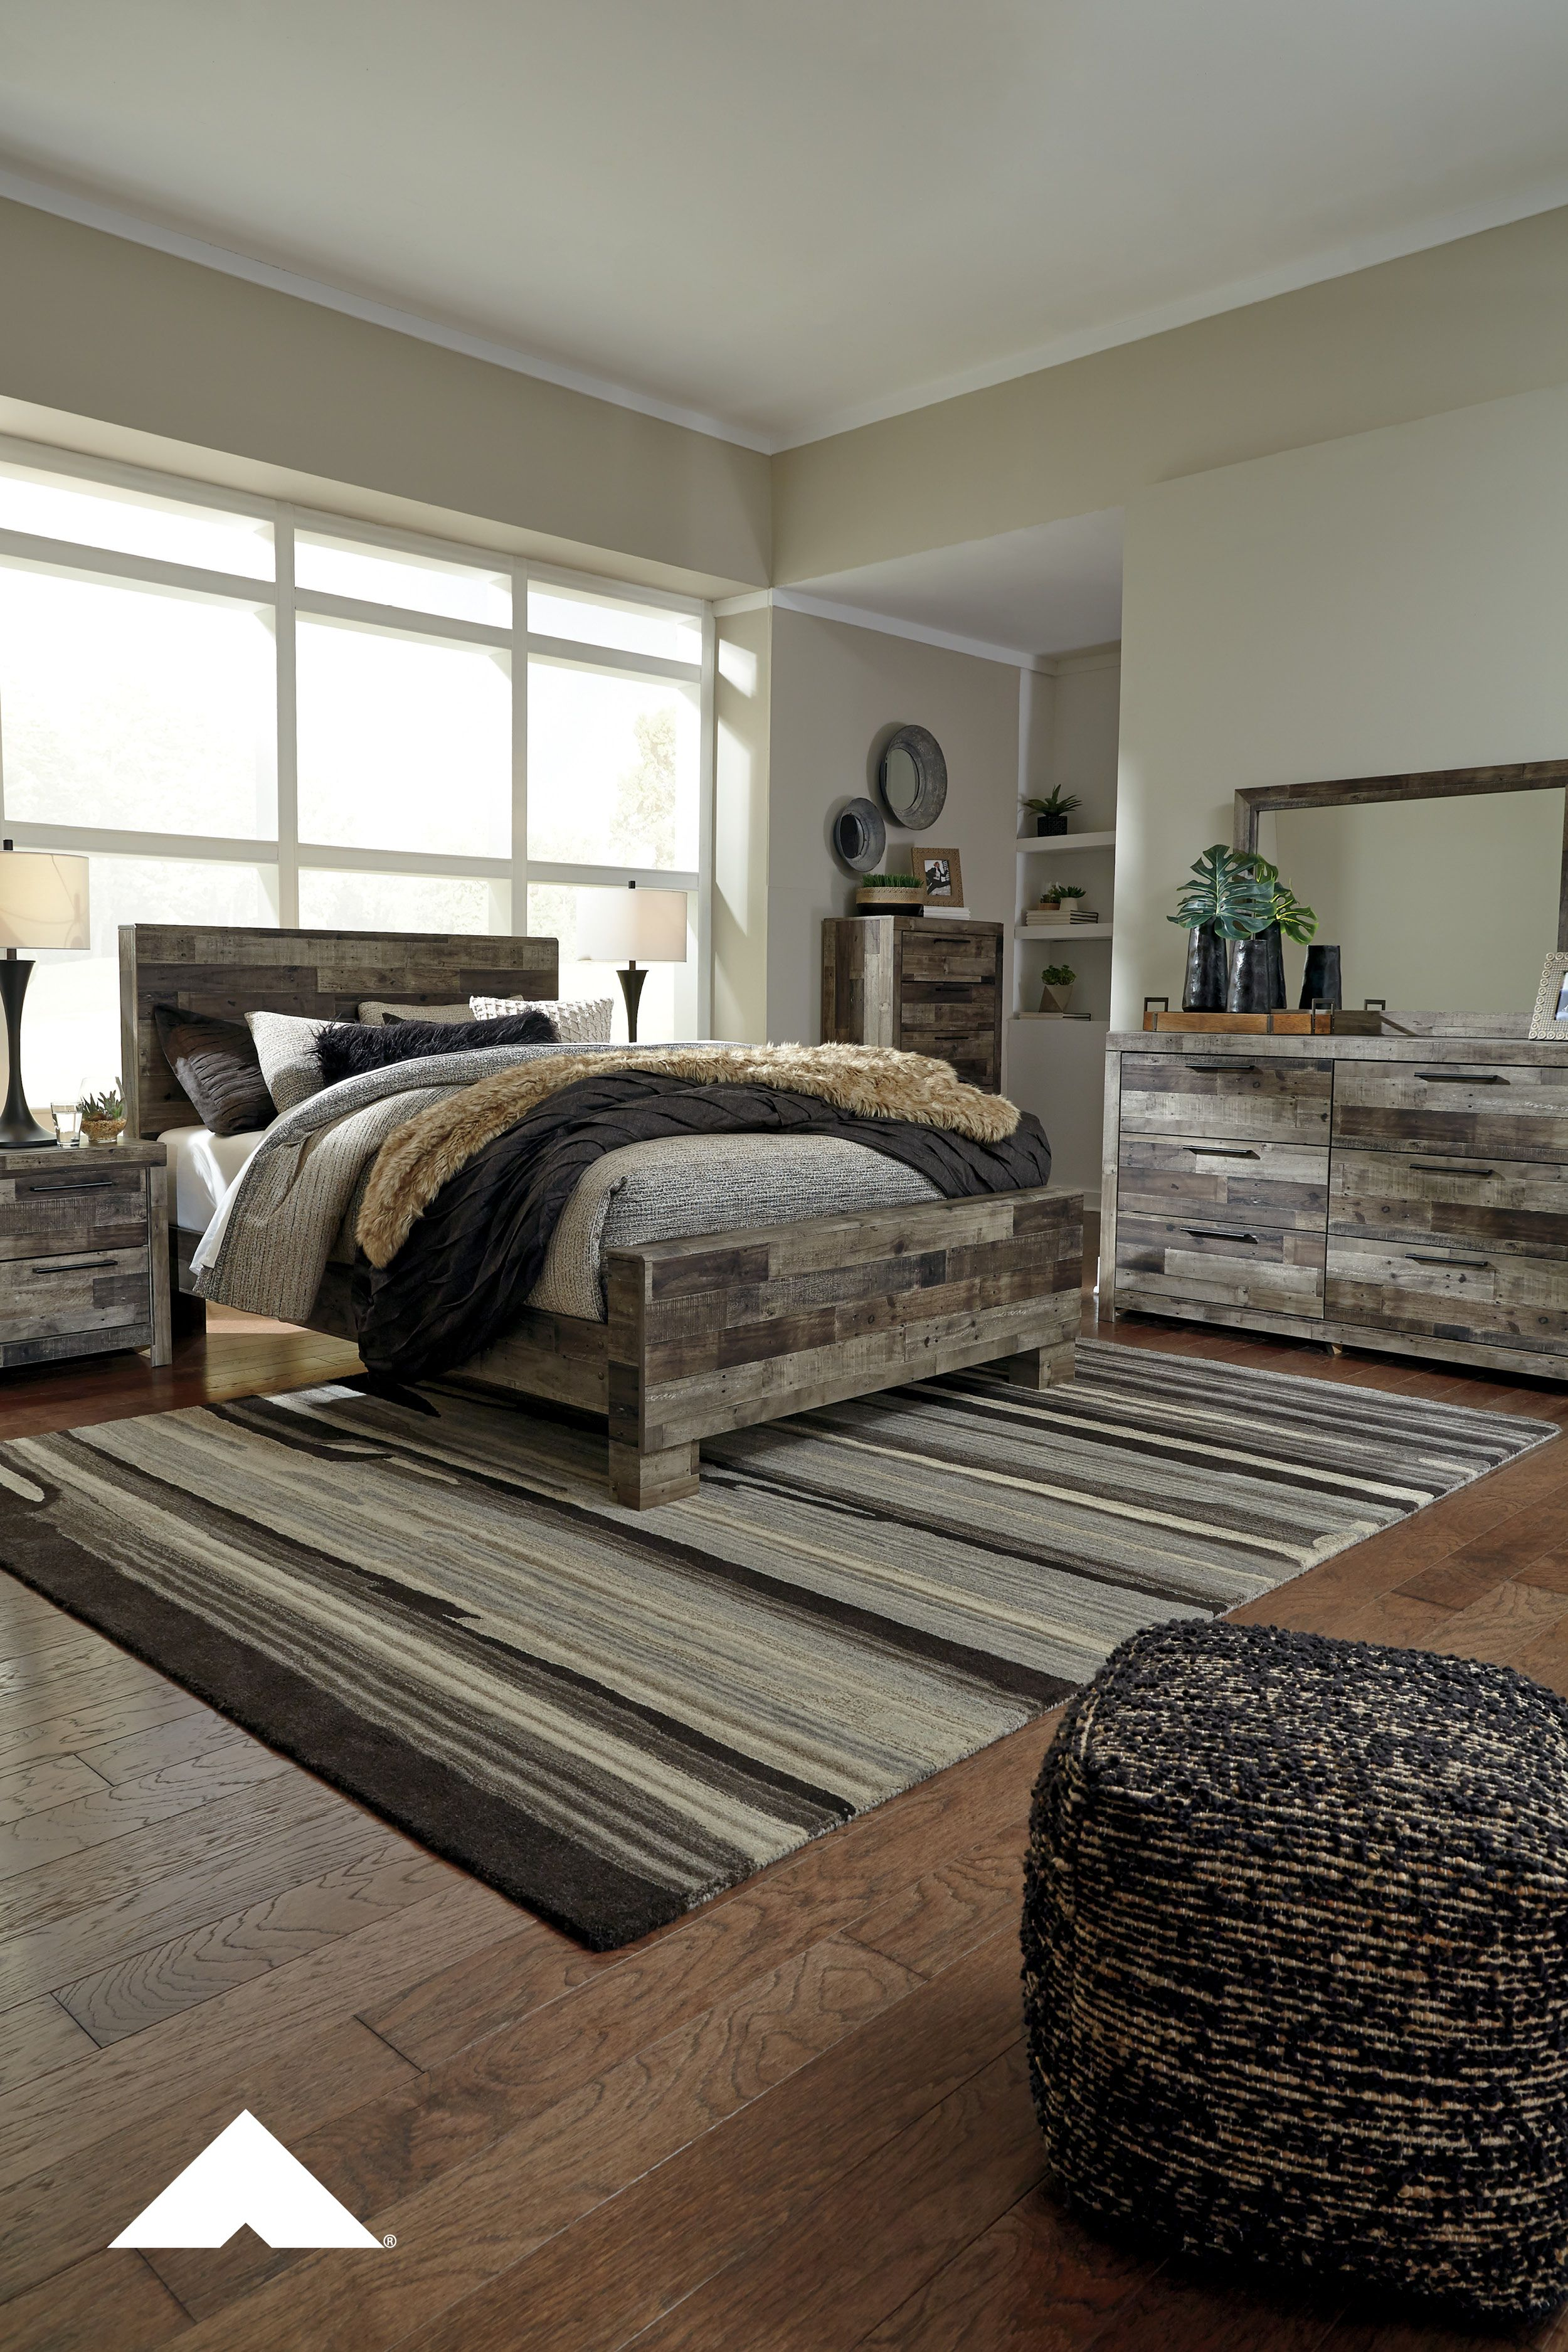 75 Ashley Bedroom Set Rustic Best